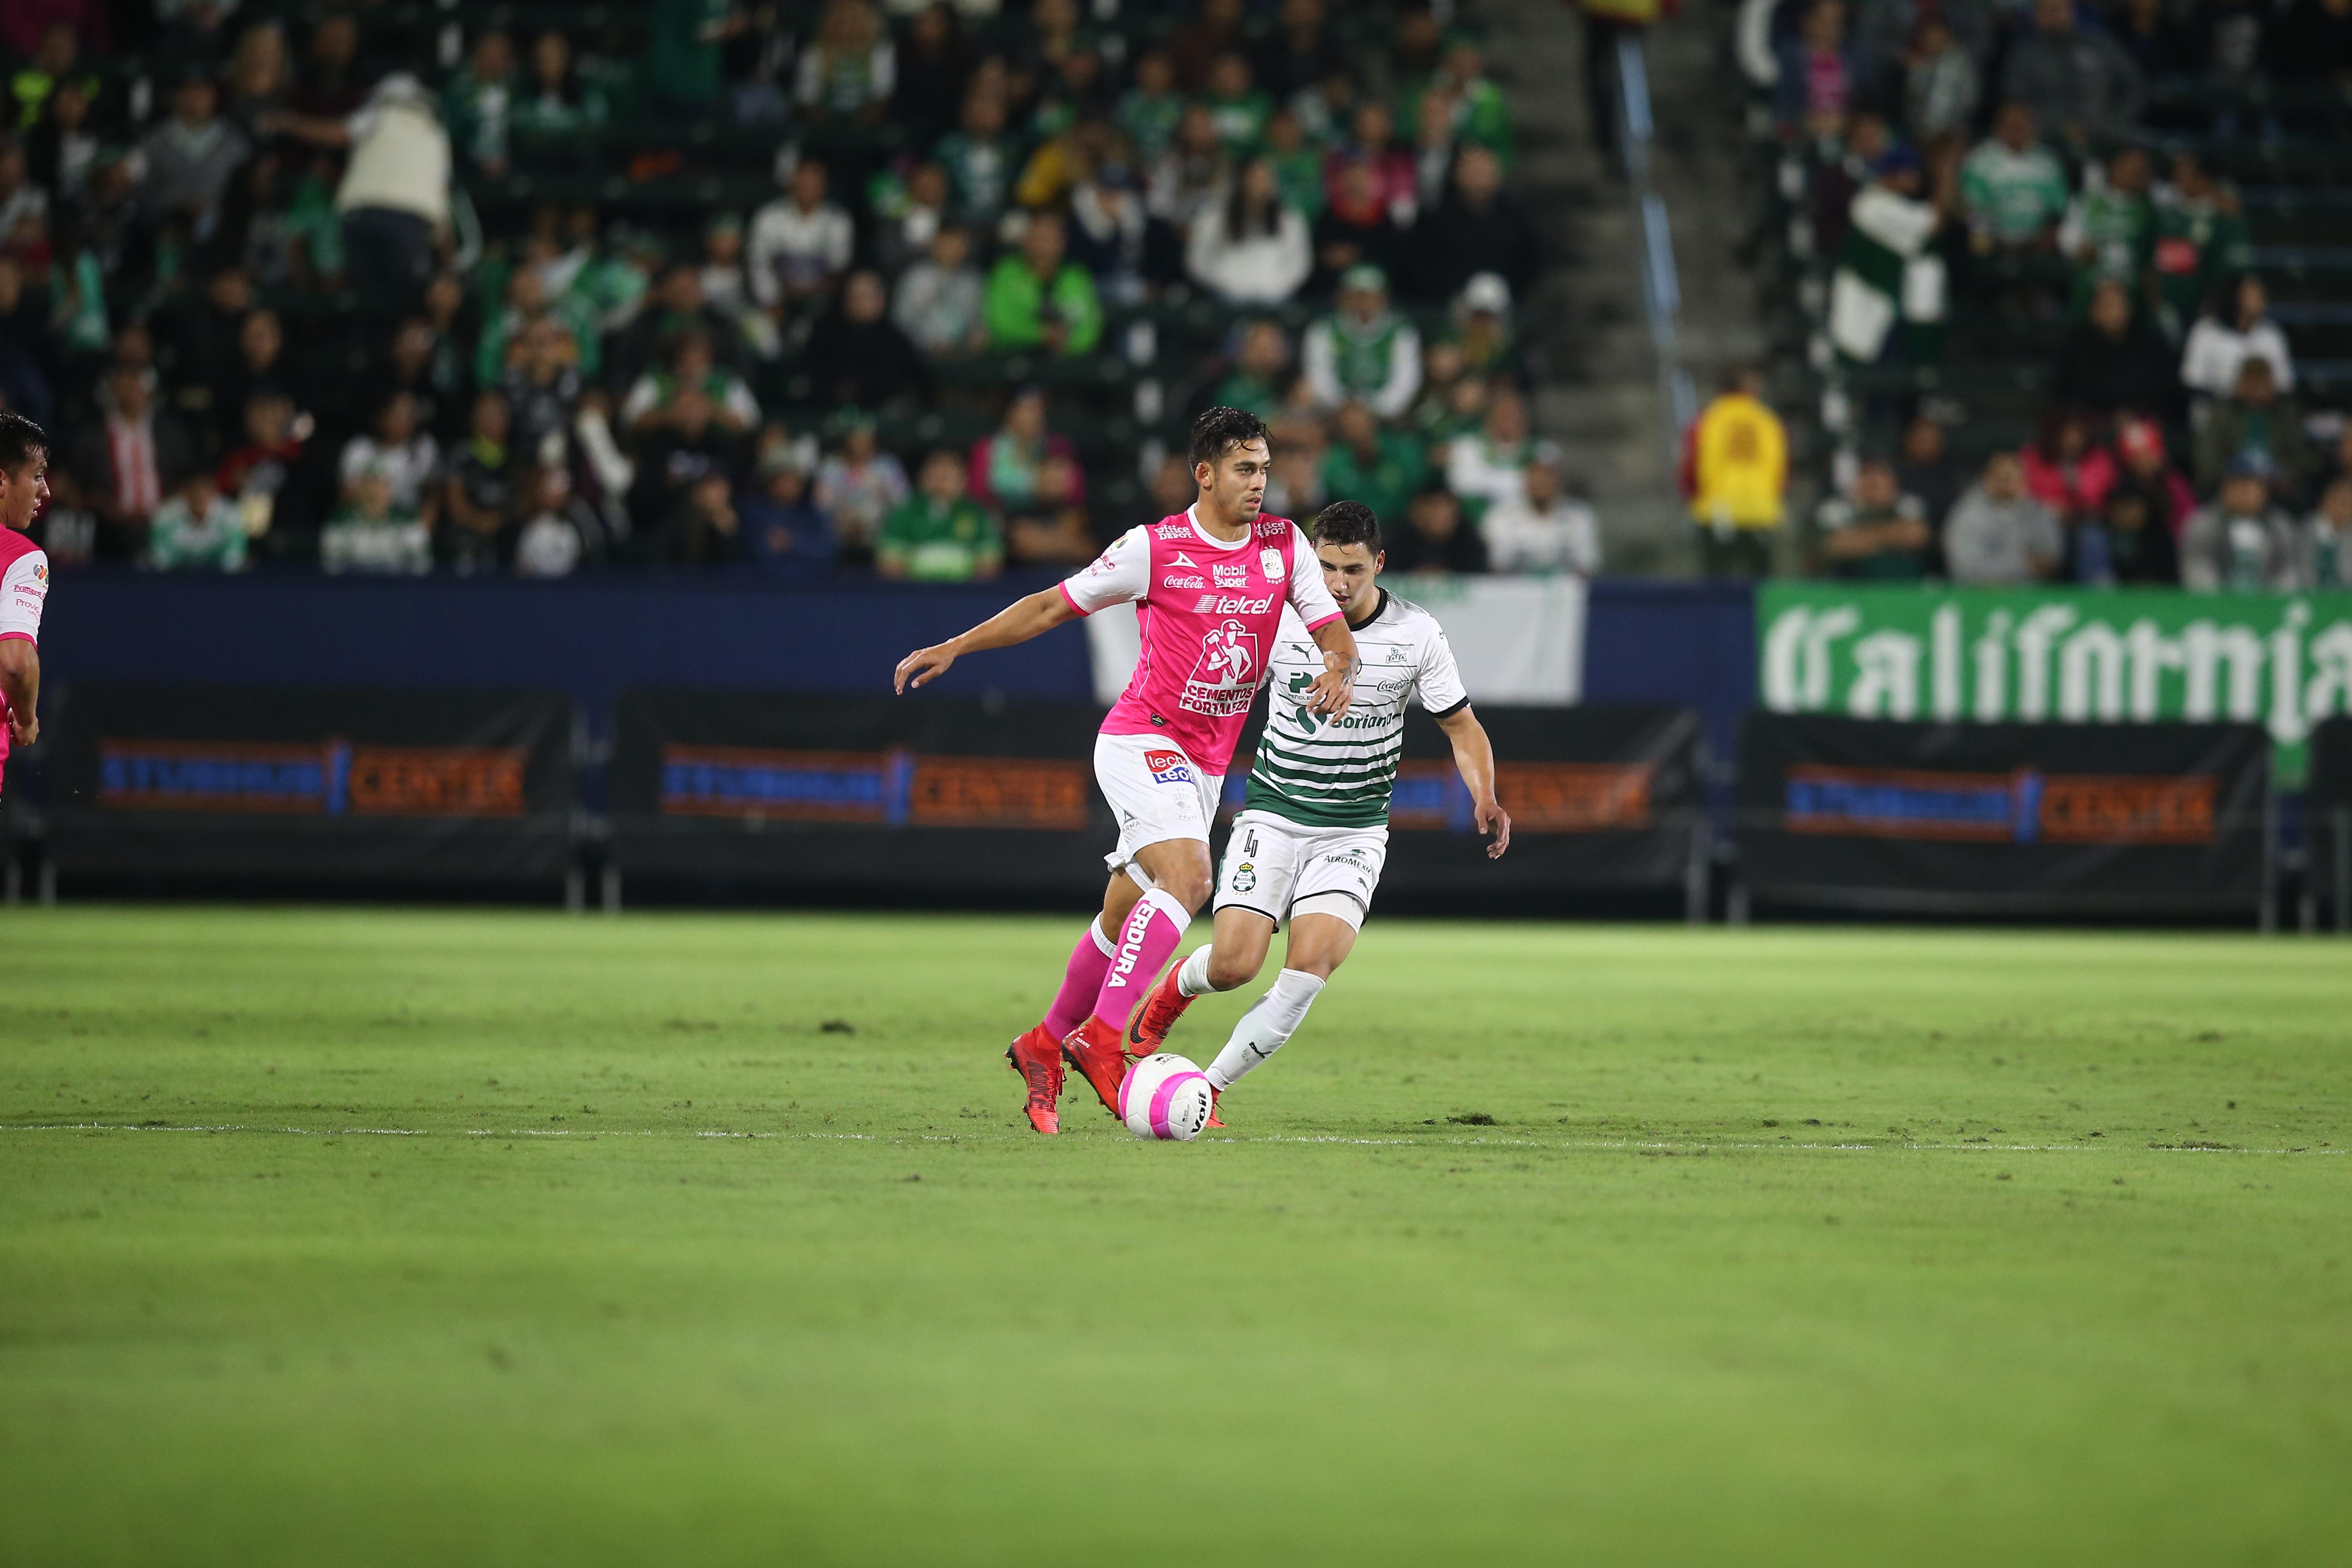 Club Santos Laguna and Club León battle at StubHub Center